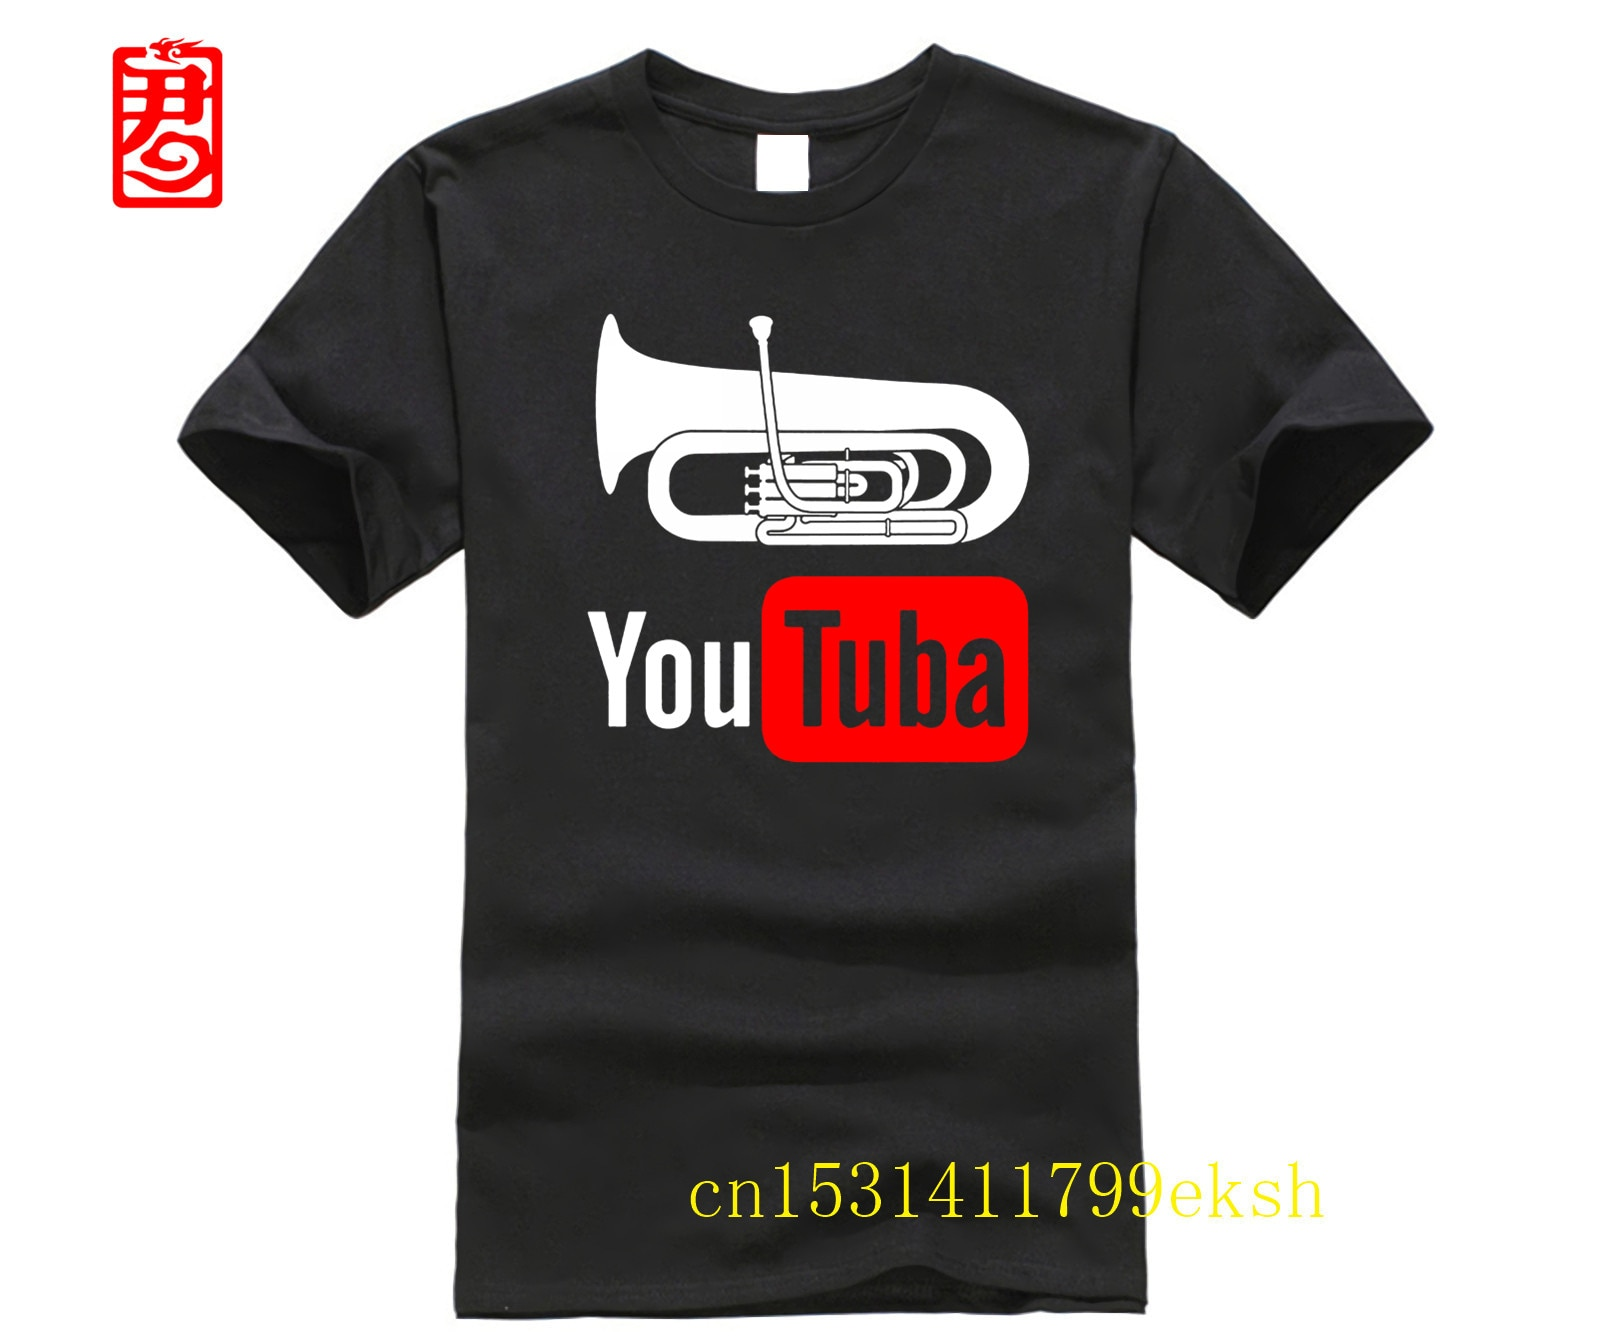 Camiseta de hombre YouTuba, divertida camiseta para jugadores de Tuba, camiseta Unisex 8091